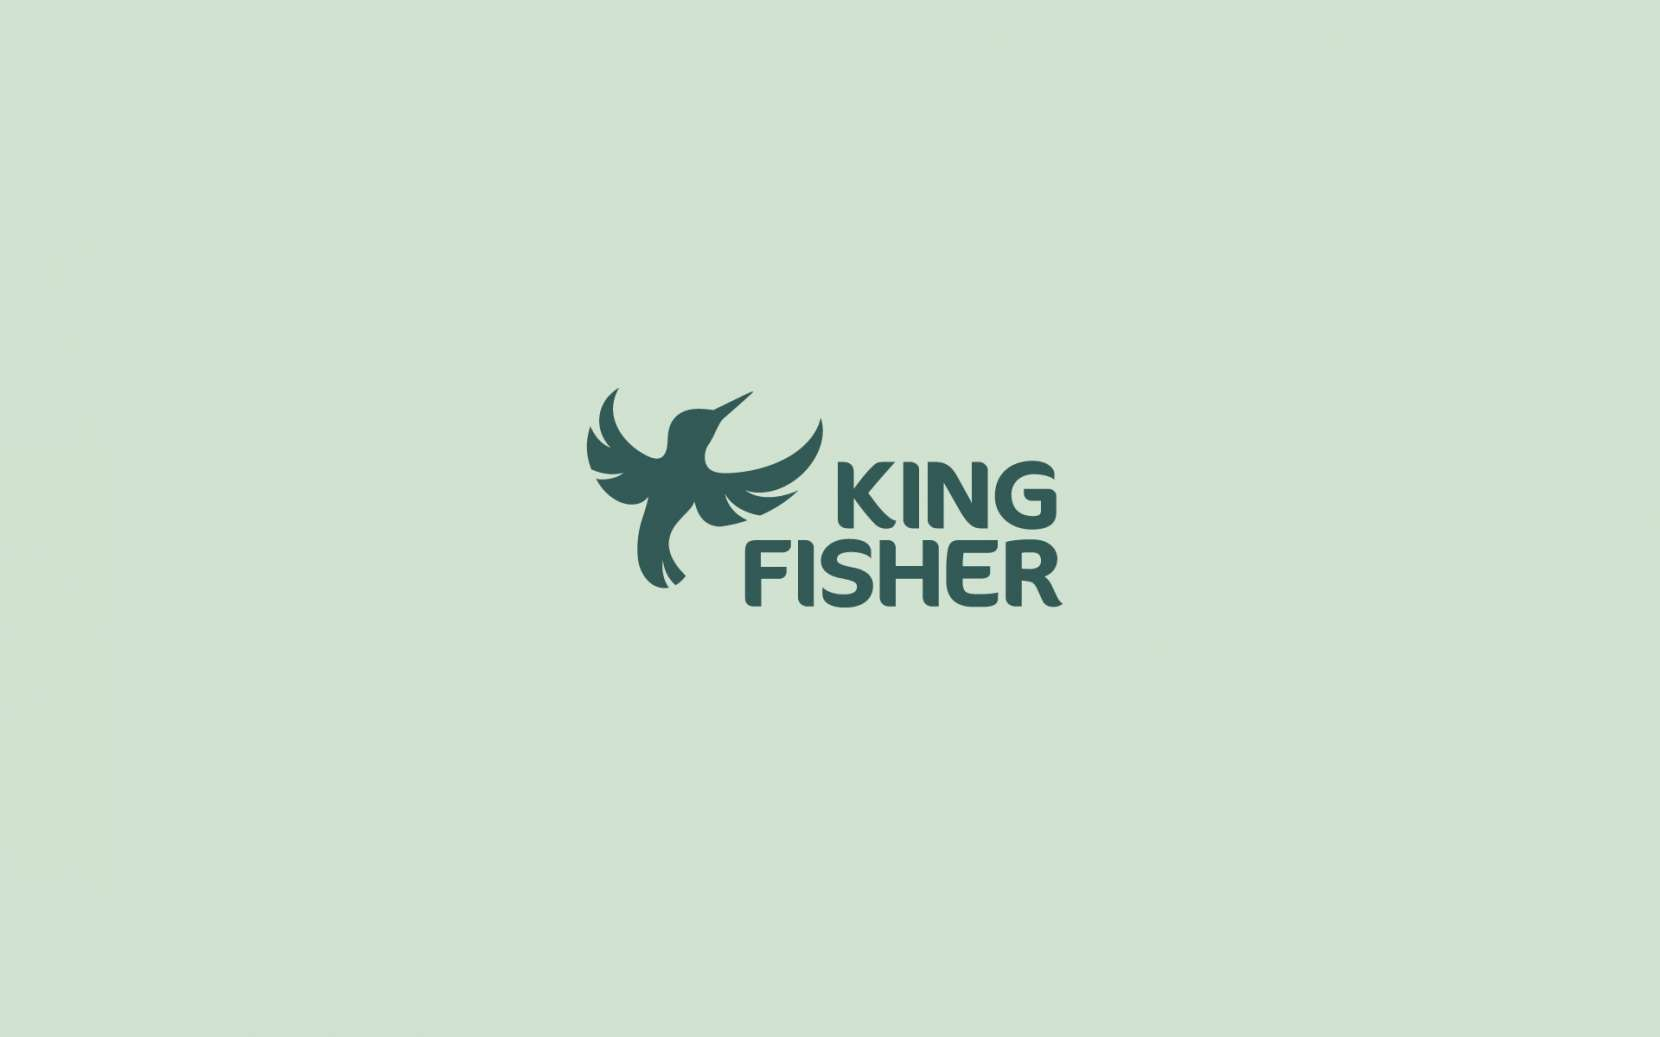 King-Fisher.jpg